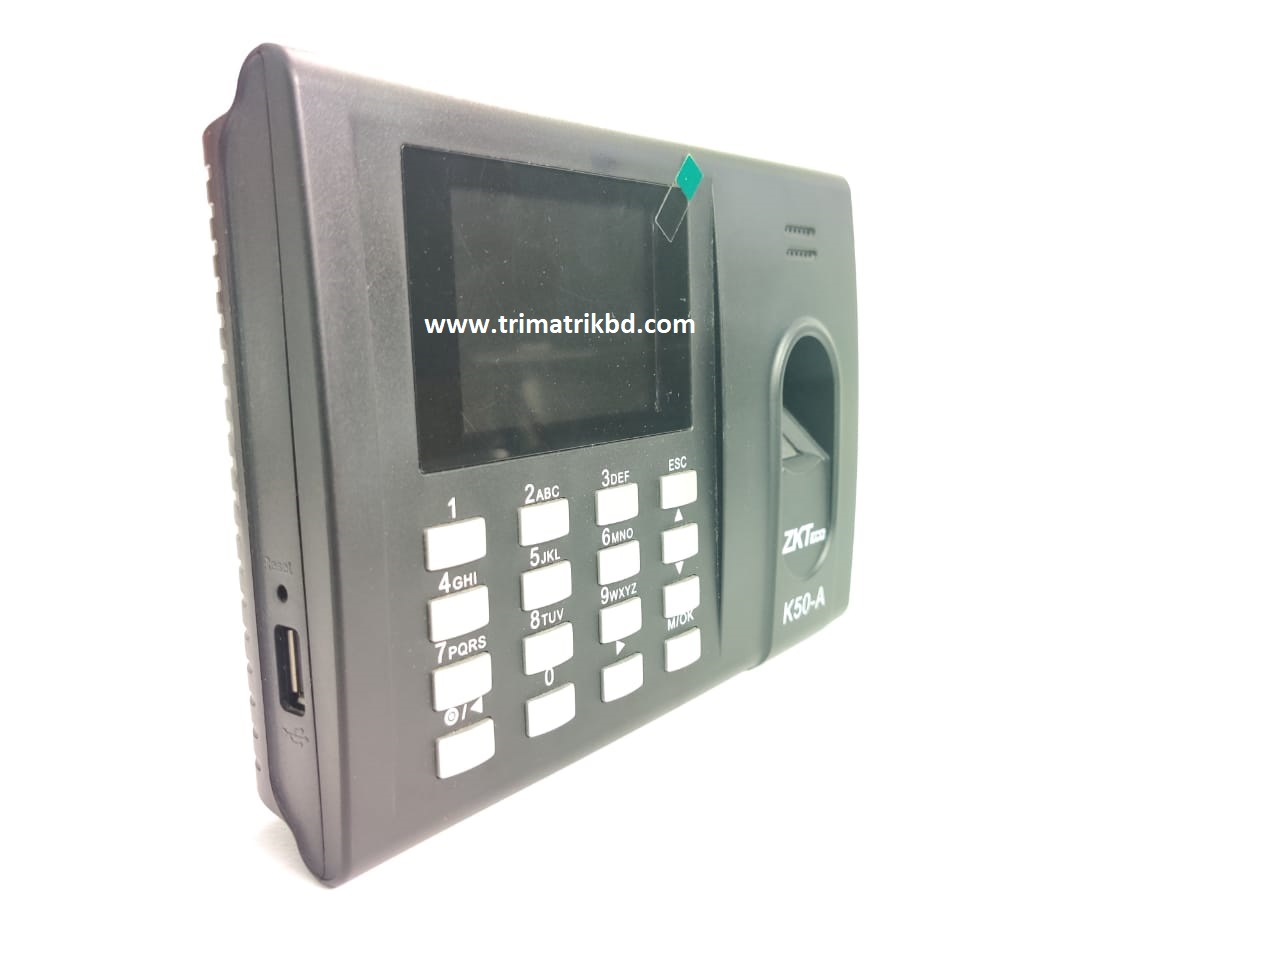 ZKTeco K50A price in Bangladesh